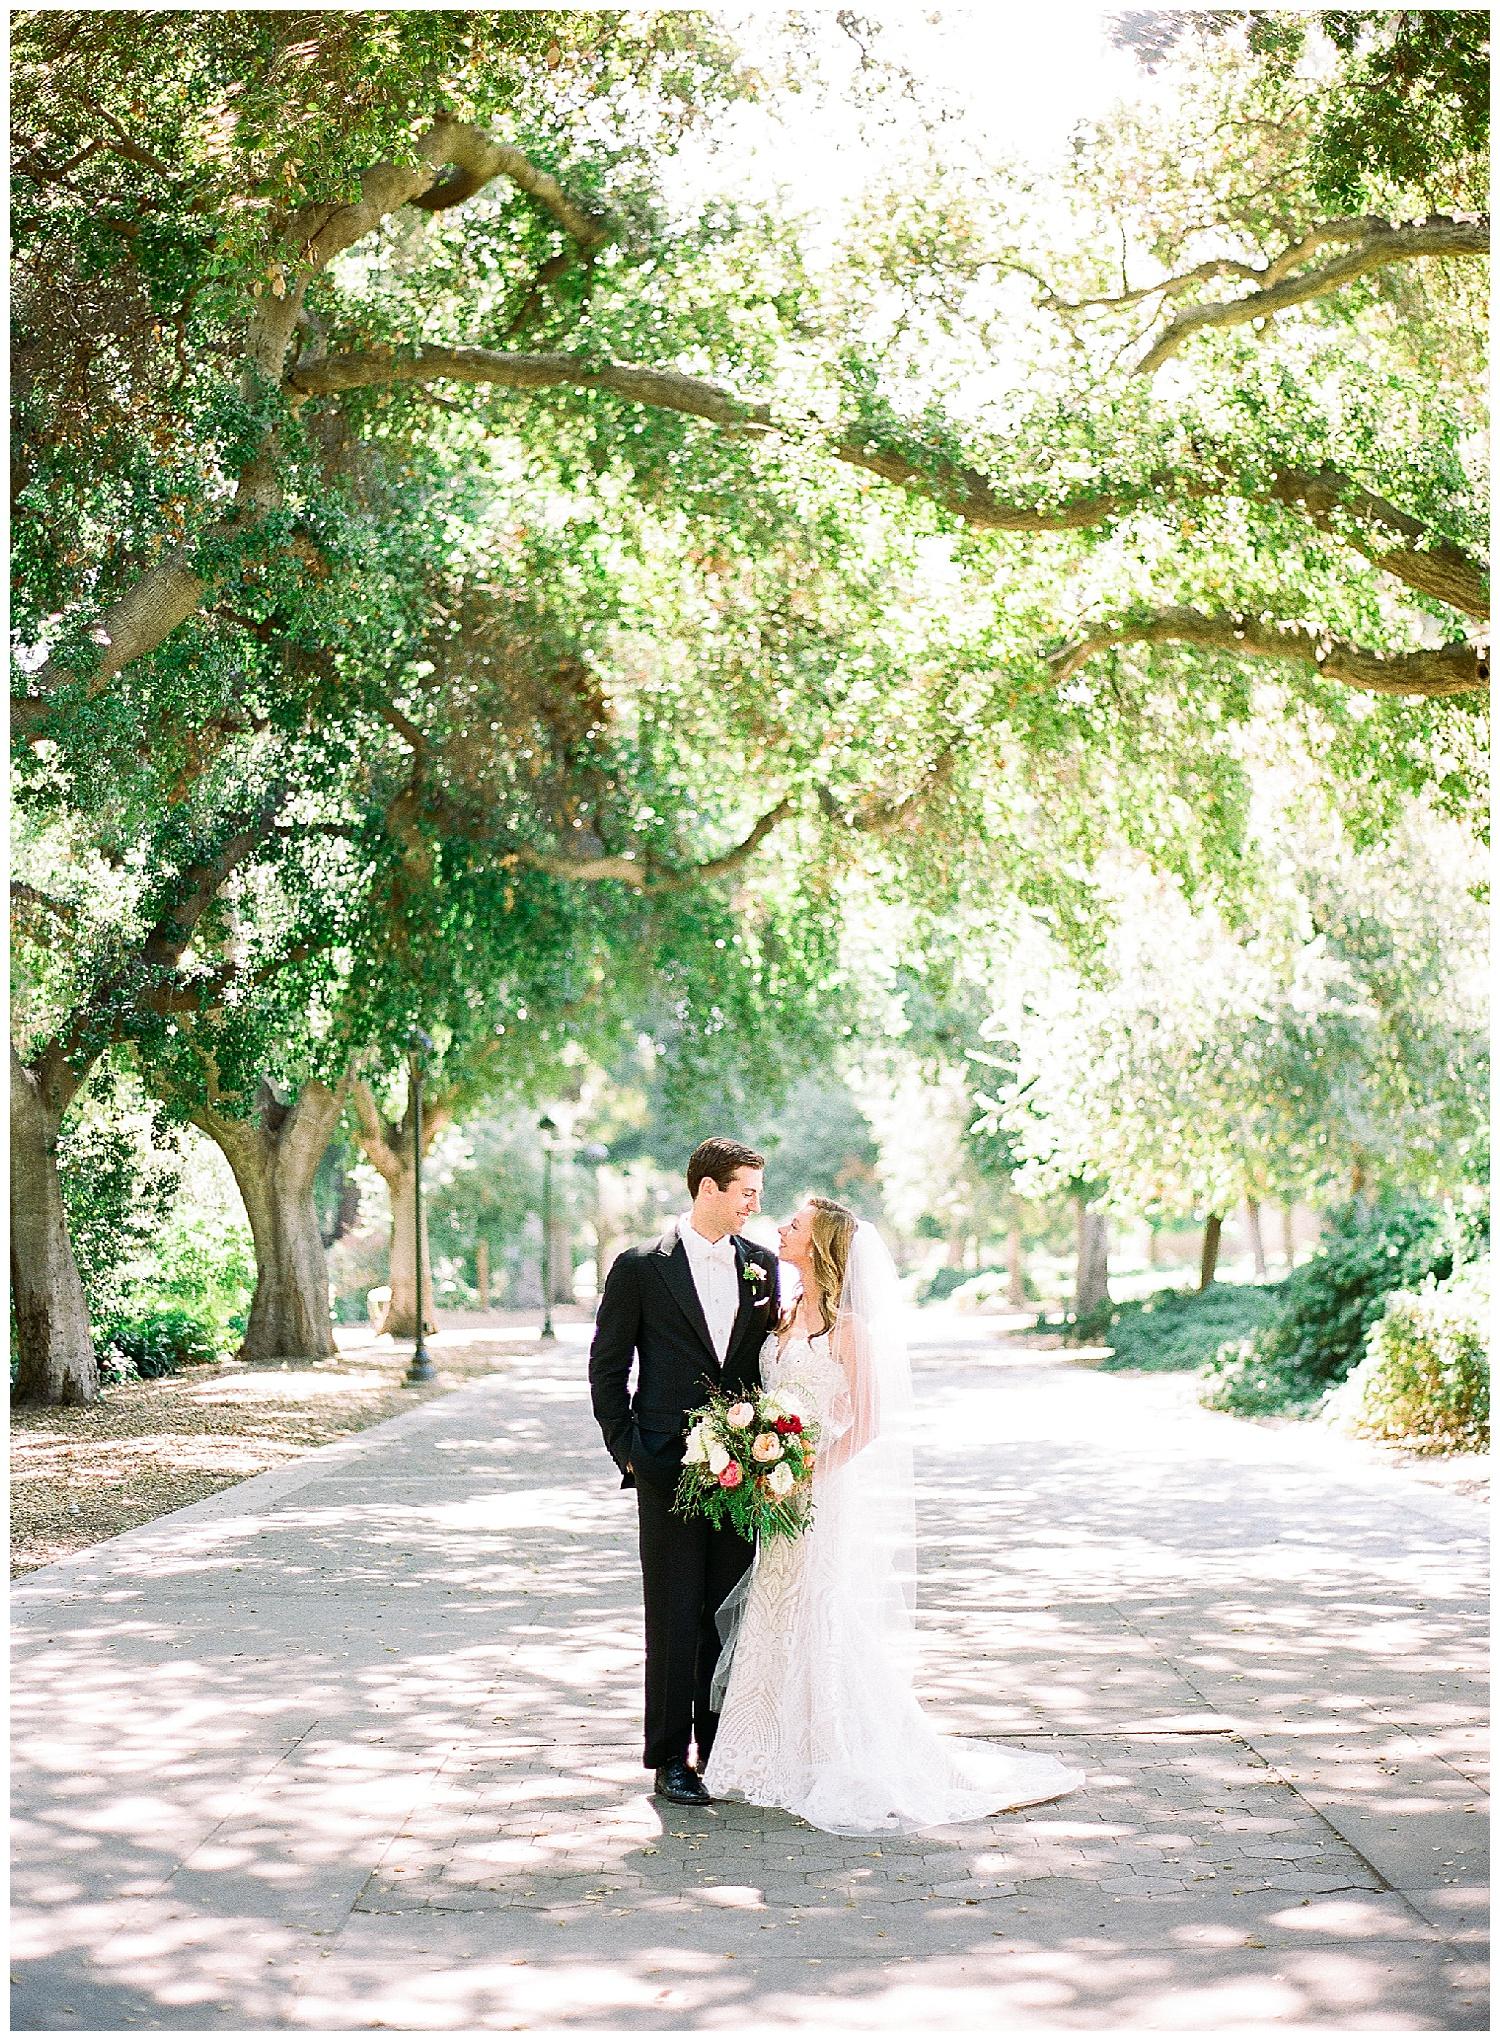 Janine_Licare_Photography_San_Francisco_Wedding_Photographer_Southern_California_0045.jpg